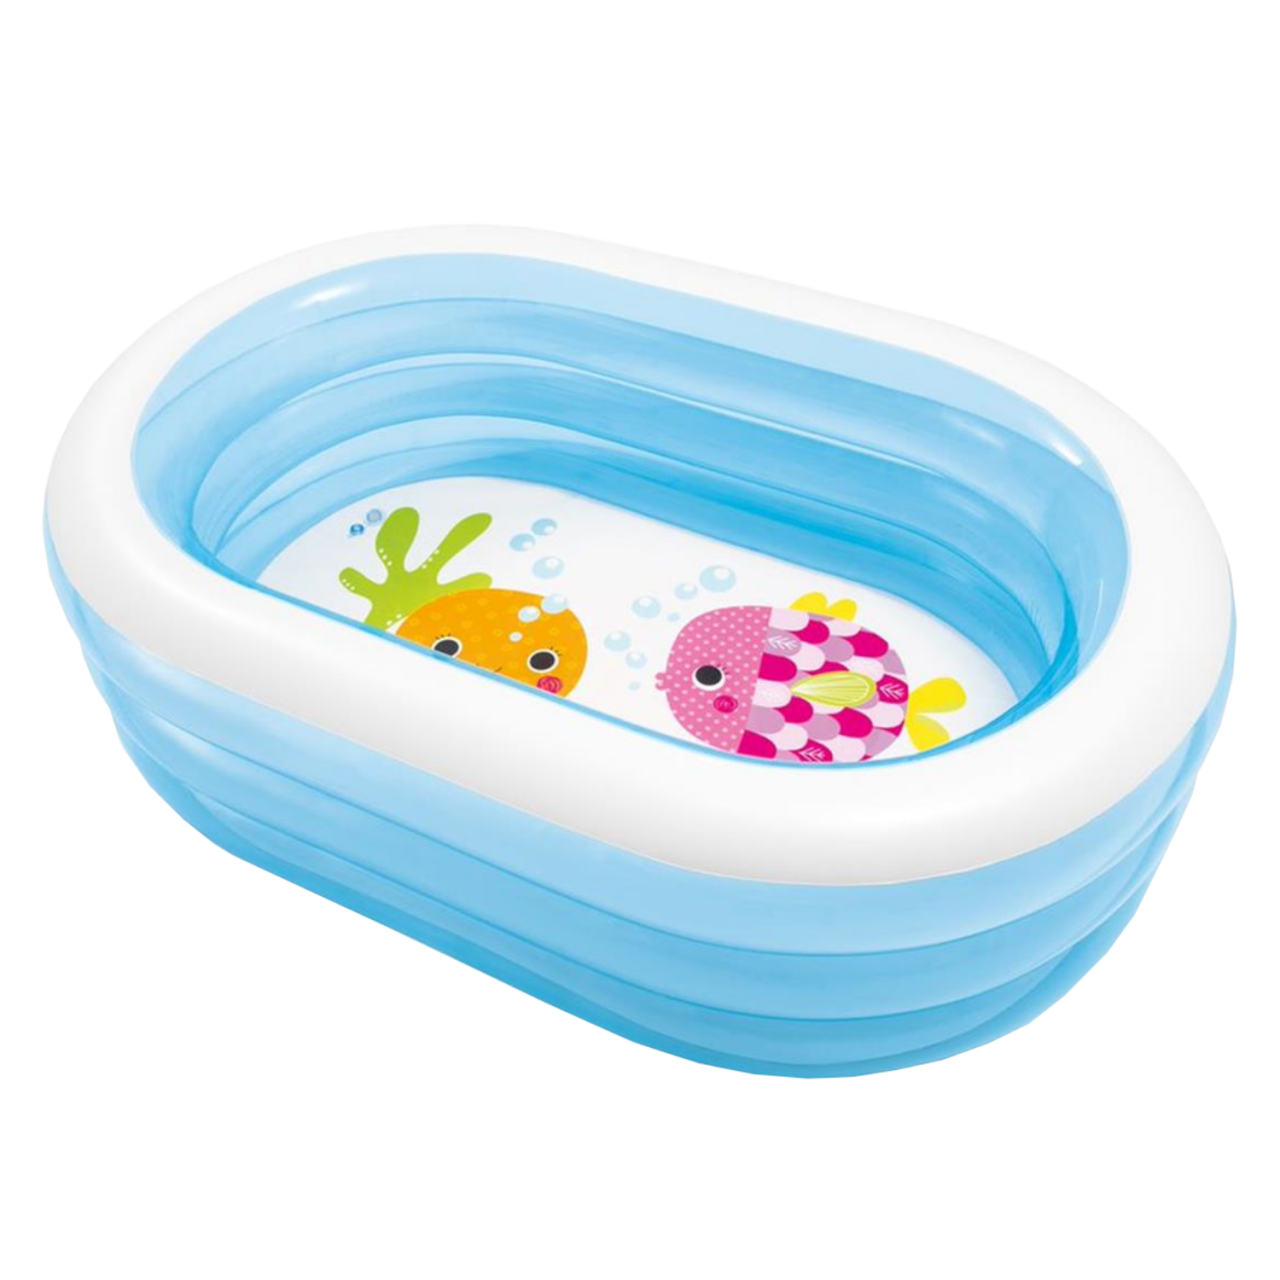 Intex 57482 Planschbecken Swimming Pool Kinderpool 163x107x46cm Oval Whale Fun